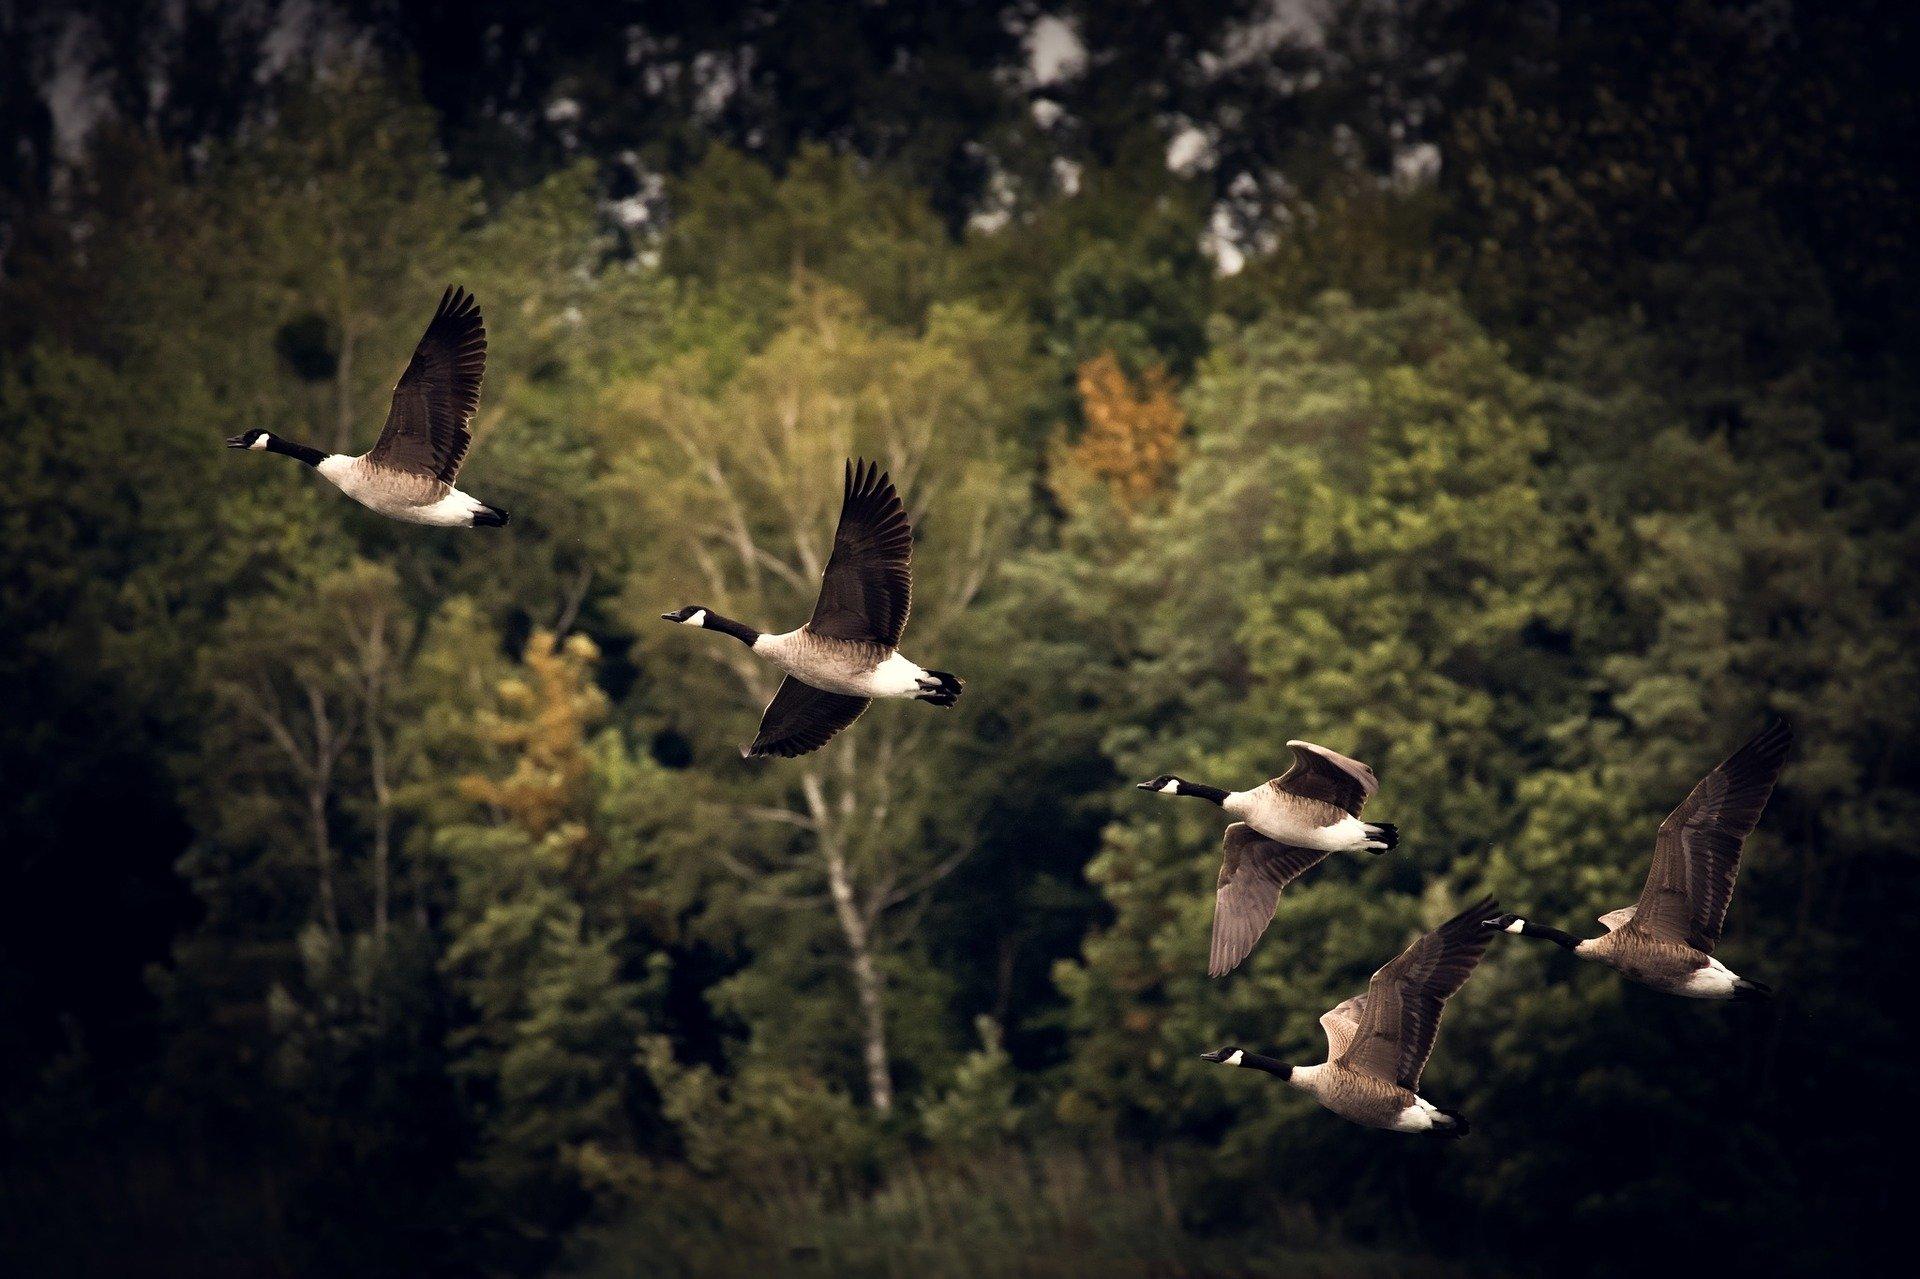 Ukrepi za zaščito ptic pred svincem